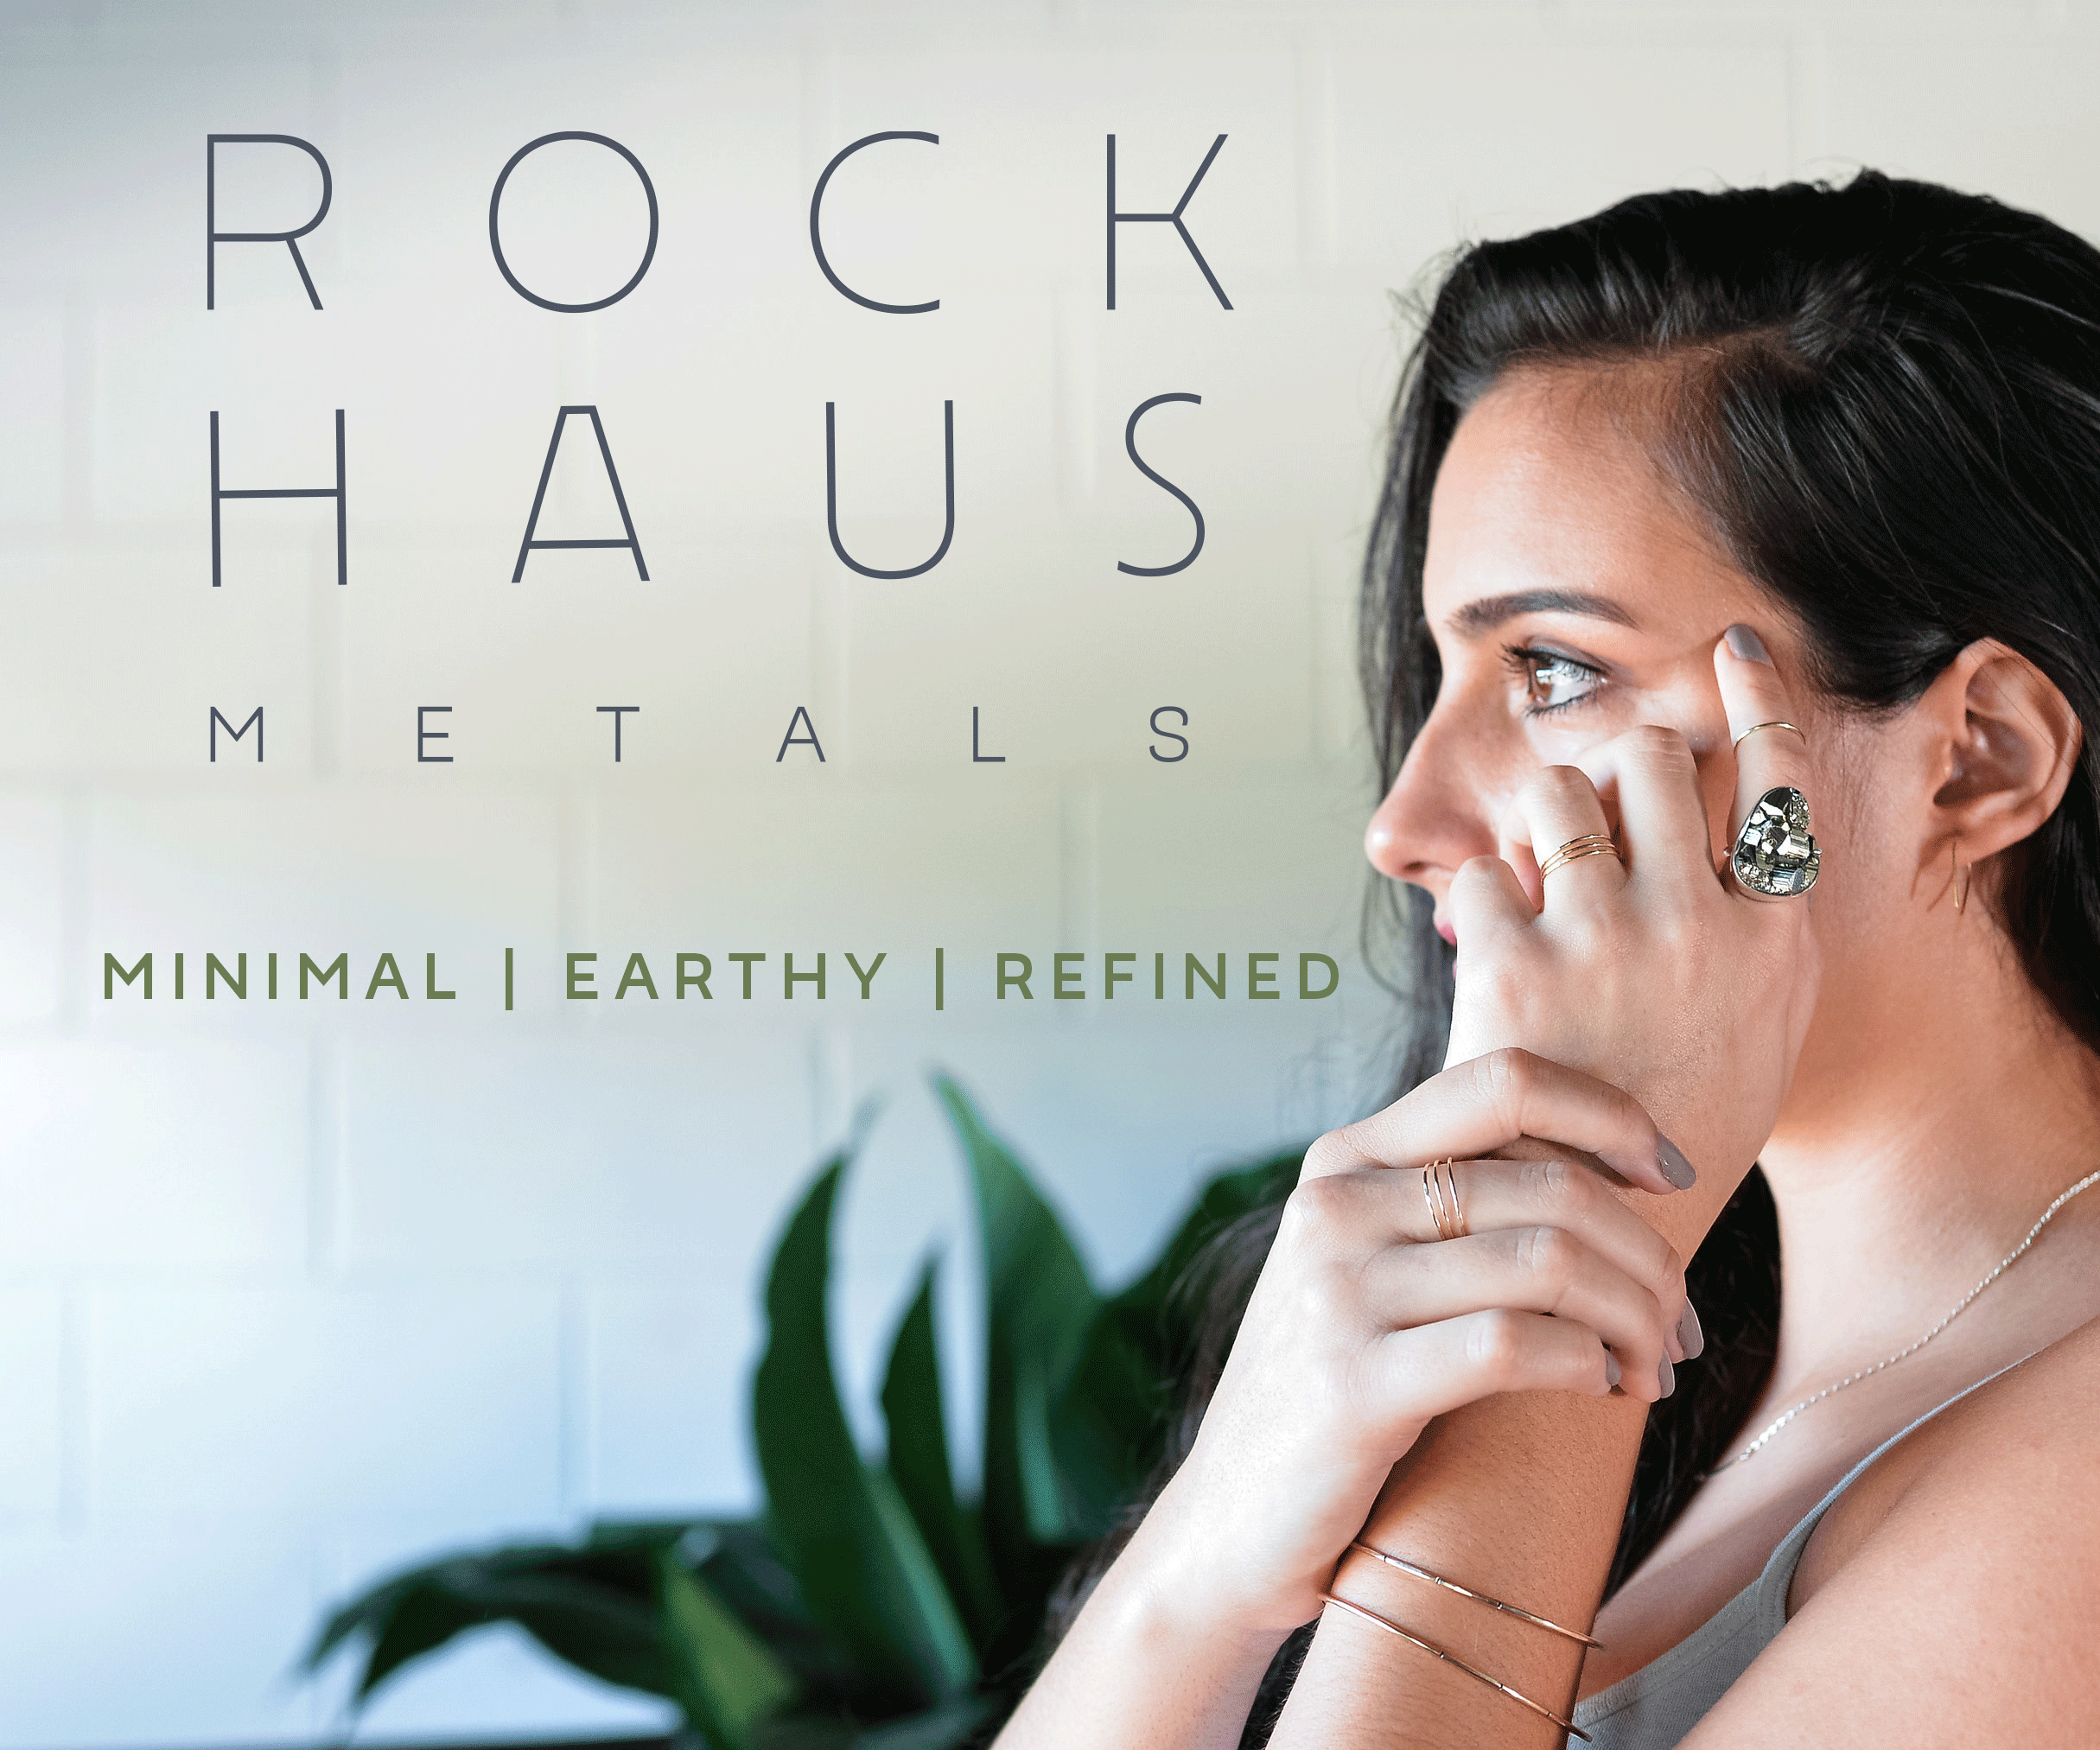 Rockhaus-Metals-Web-ad-1.png